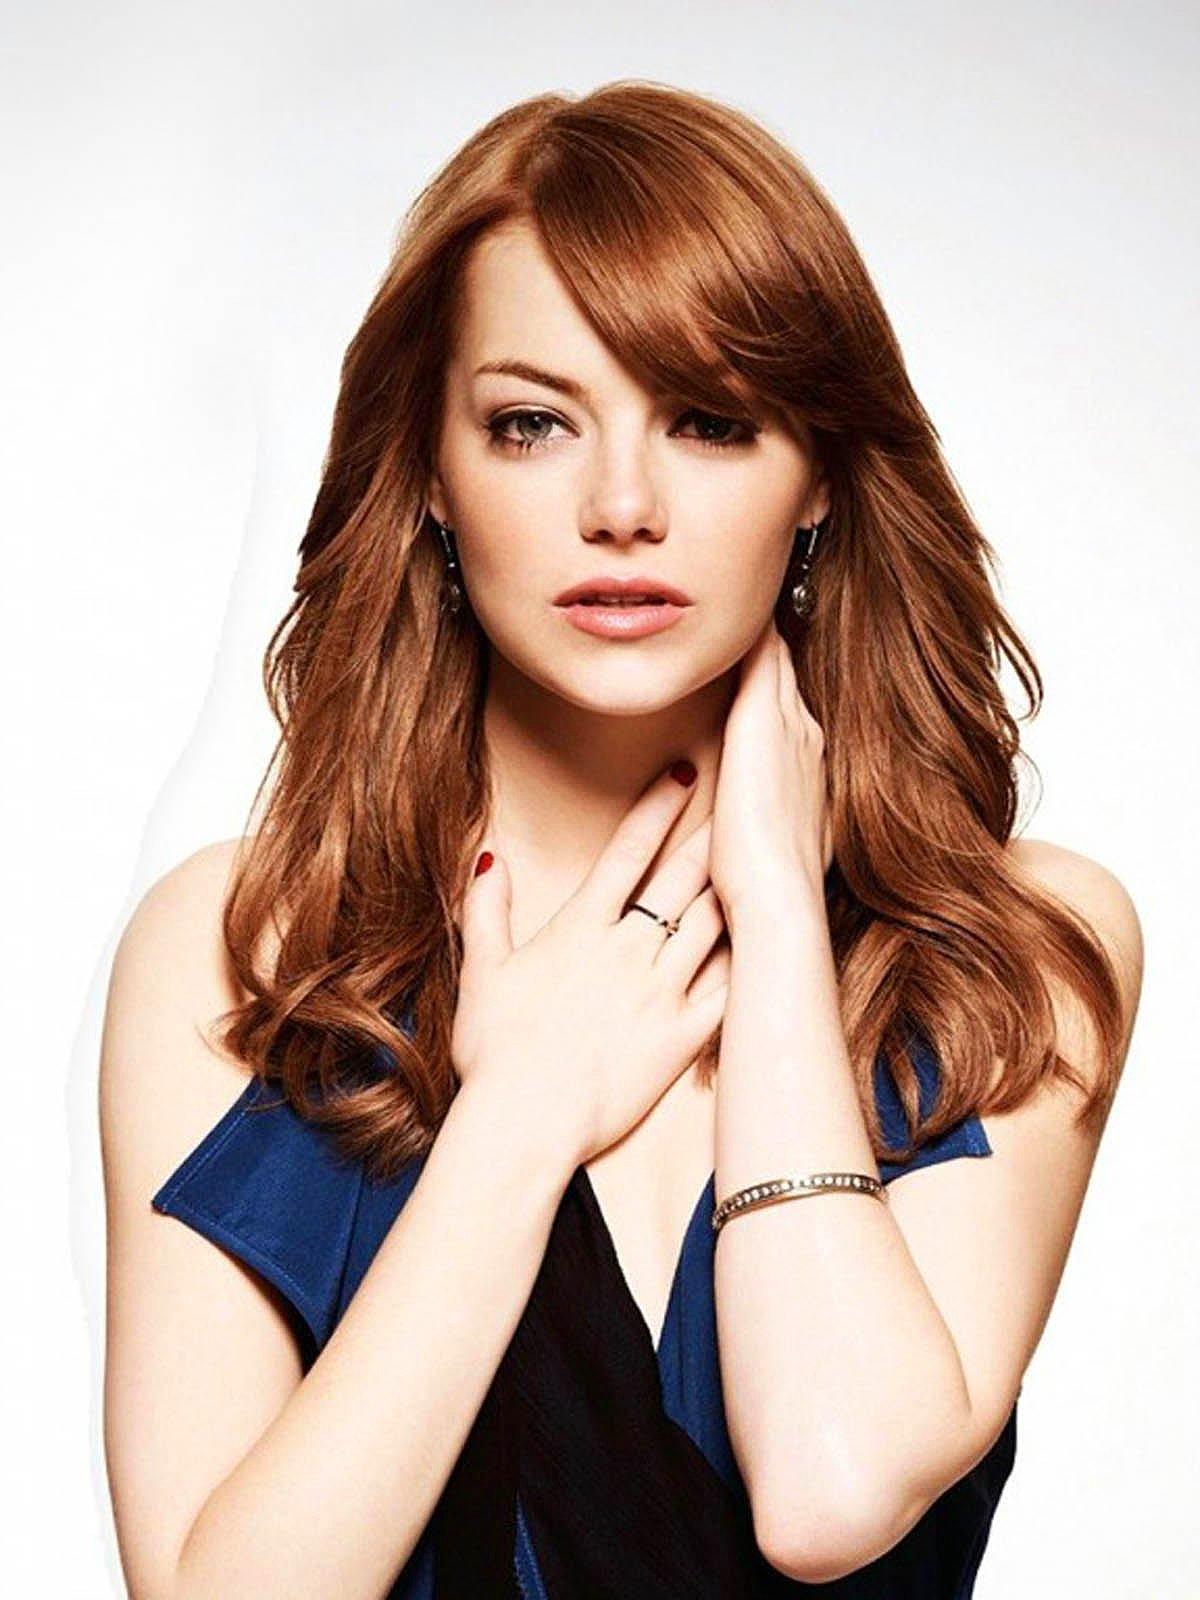 10-Beauty-Secrets-for-Women-from-the-Celebrities-5